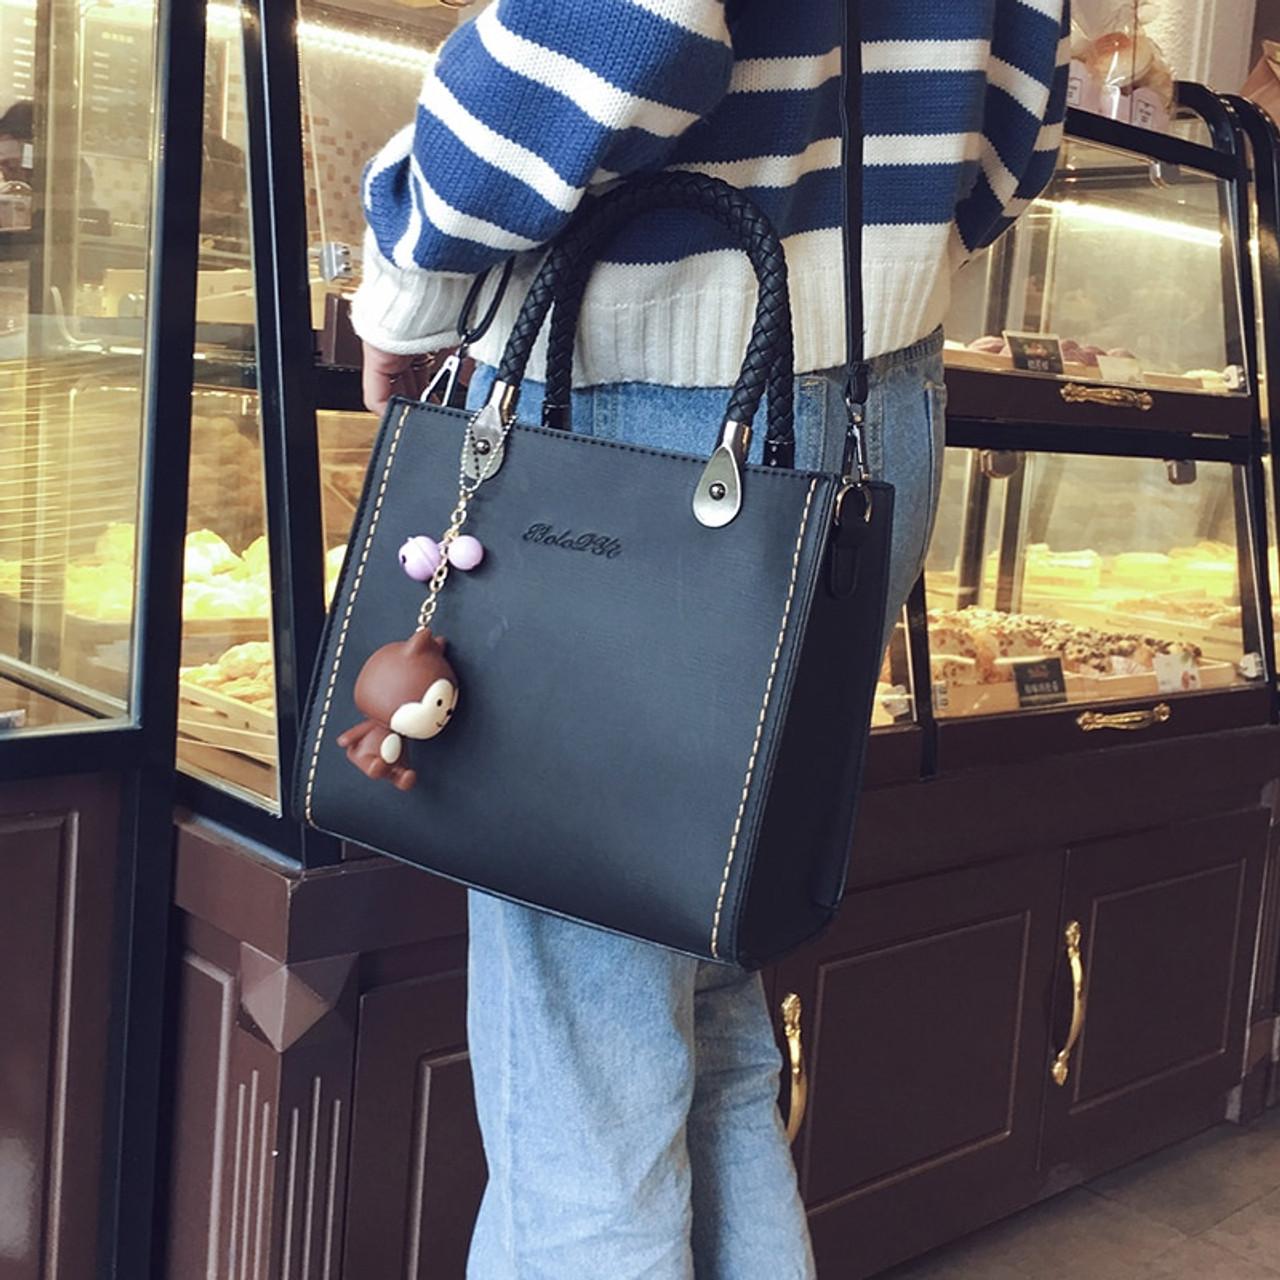 88a1f42aa328 Free shipping, 2018 new woman fashion handbags, trend leisure messenger  bag, simple Korean version women bag, retro flap.